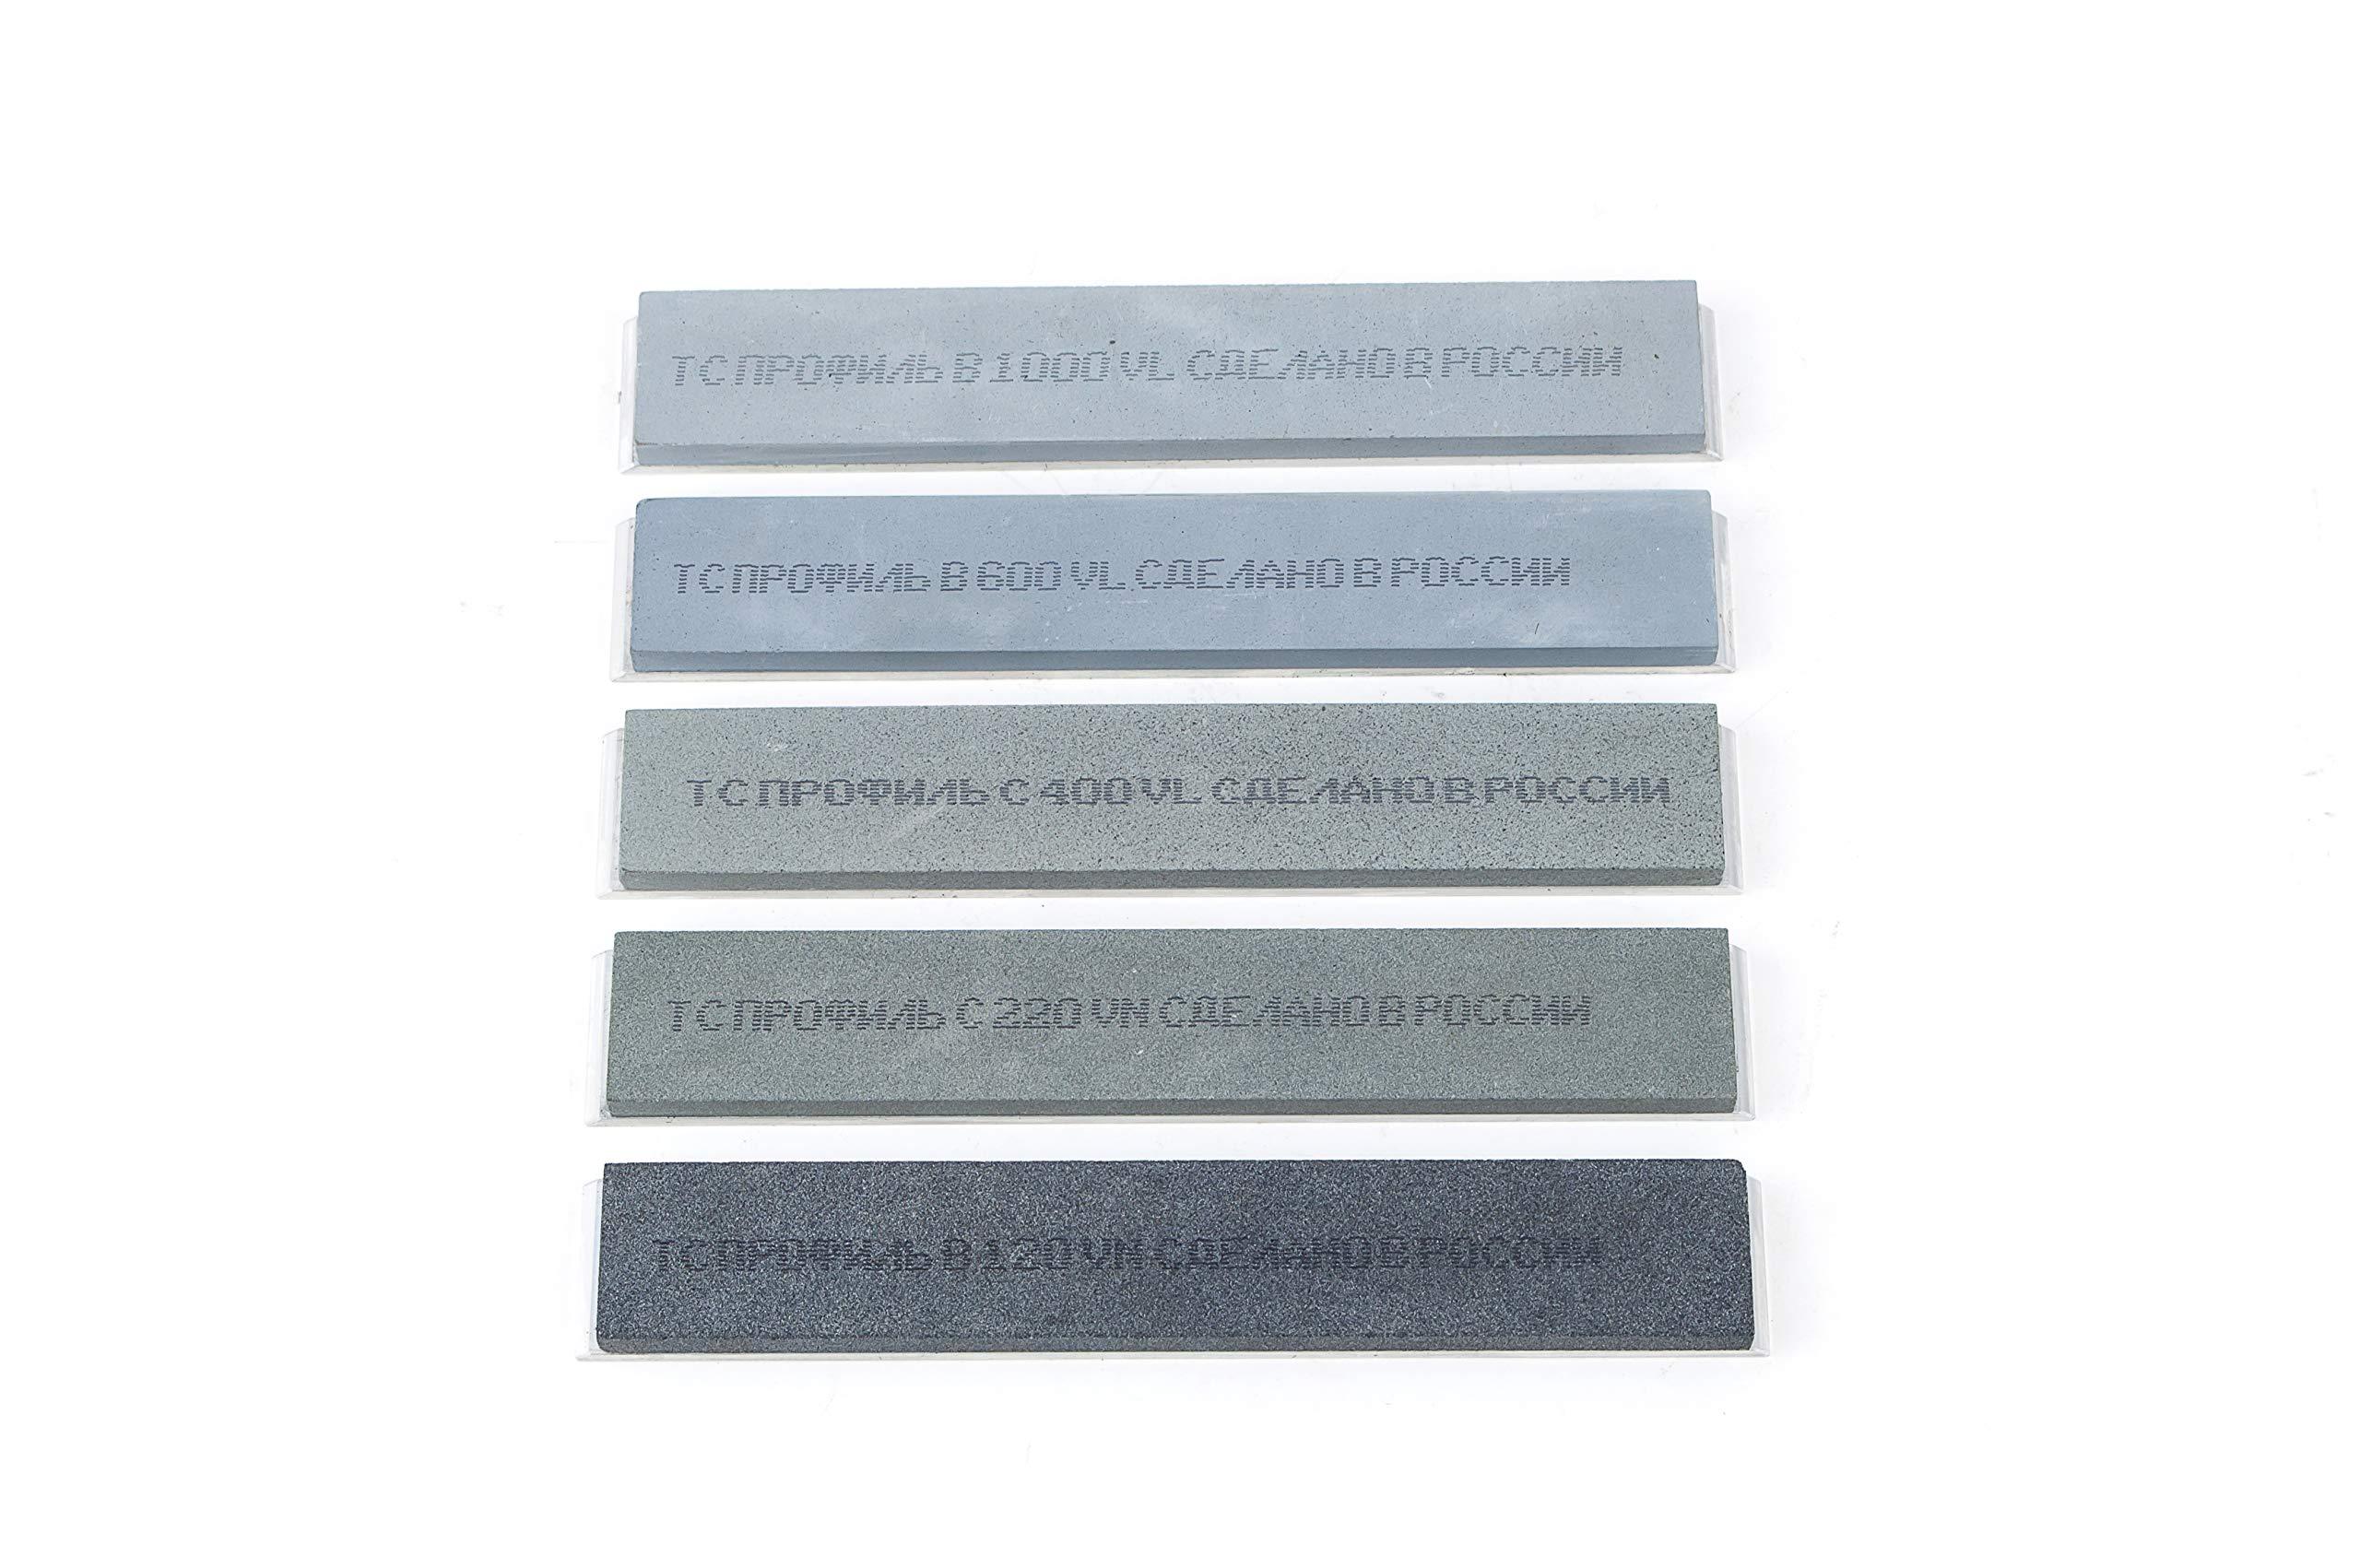 TSPROF Professional Knife Sharpener System, Knife Sharpening Kit, Gift Kit Black K03 (K02LU) by TSPROF (Image #3)